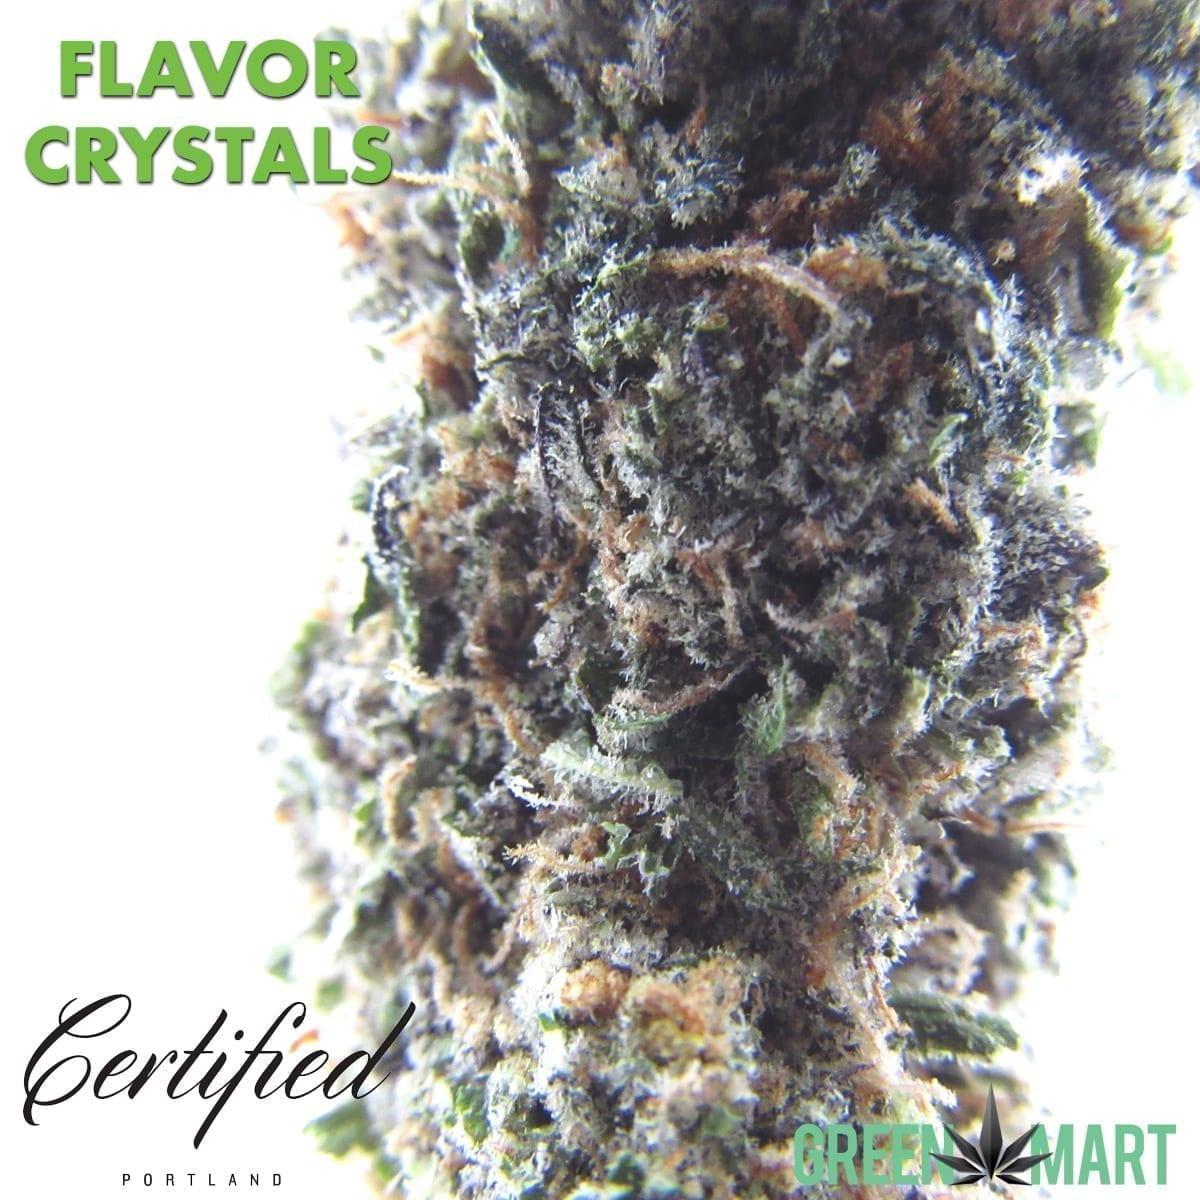 Certified Portland - Flavor Crystals